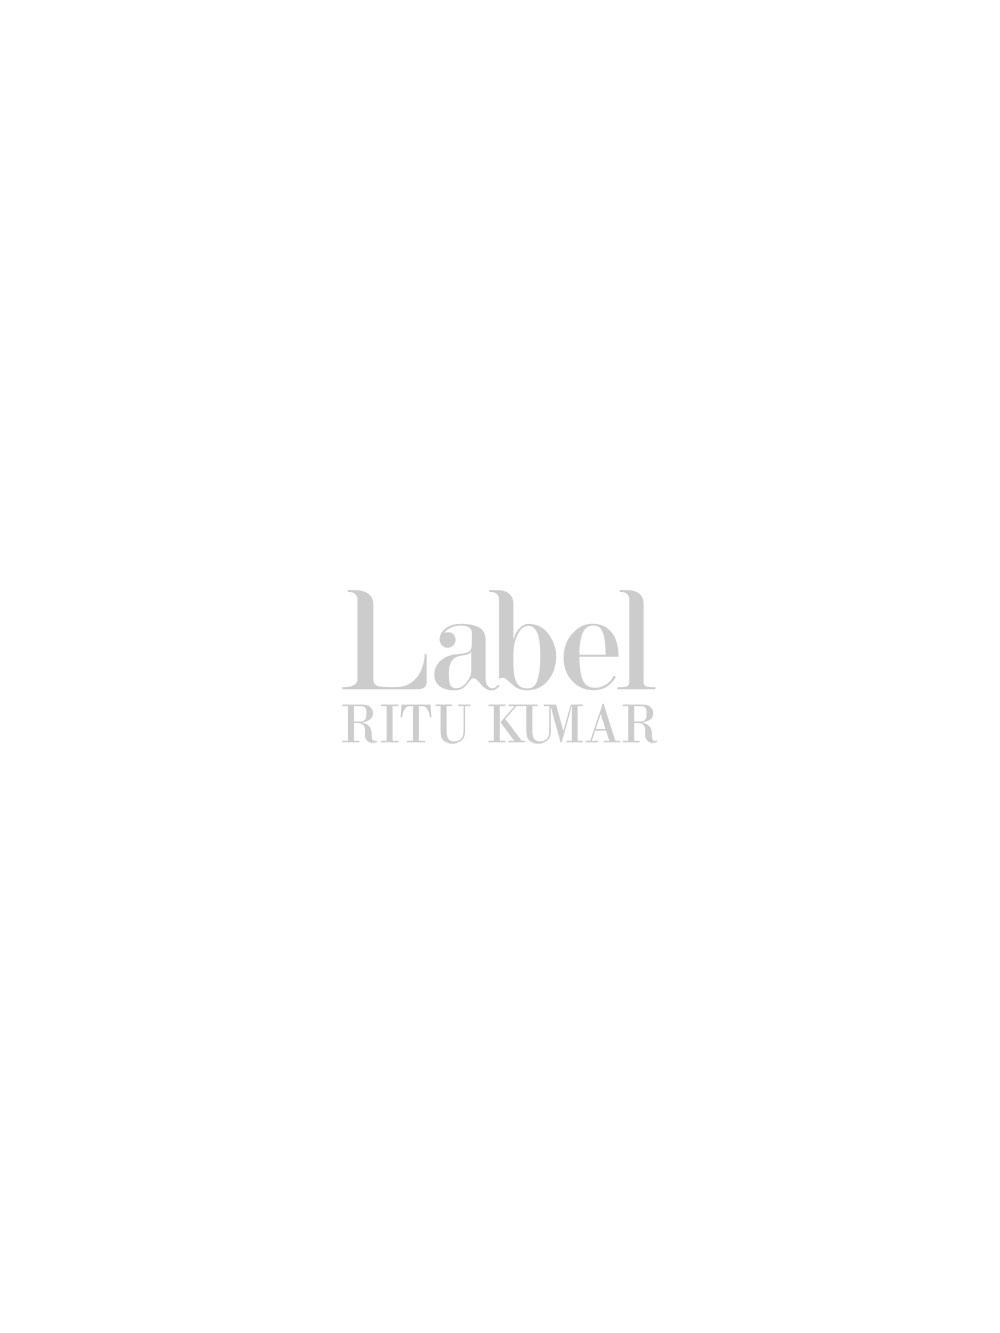 Black & White Monochrome Off-Shoulder Dress